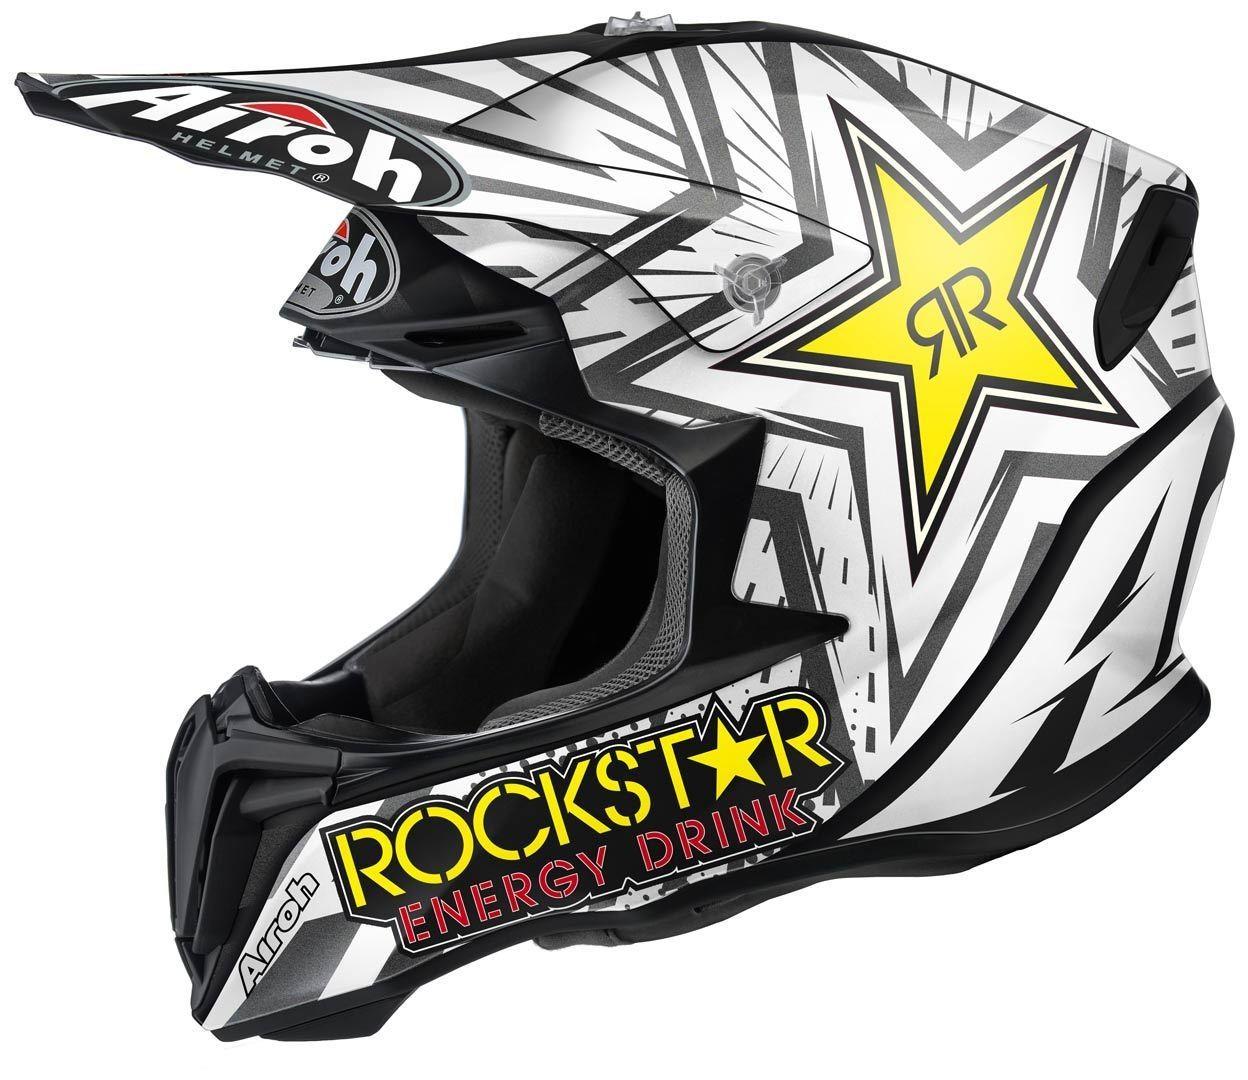 Casco cross Airoh Twist Rockstar